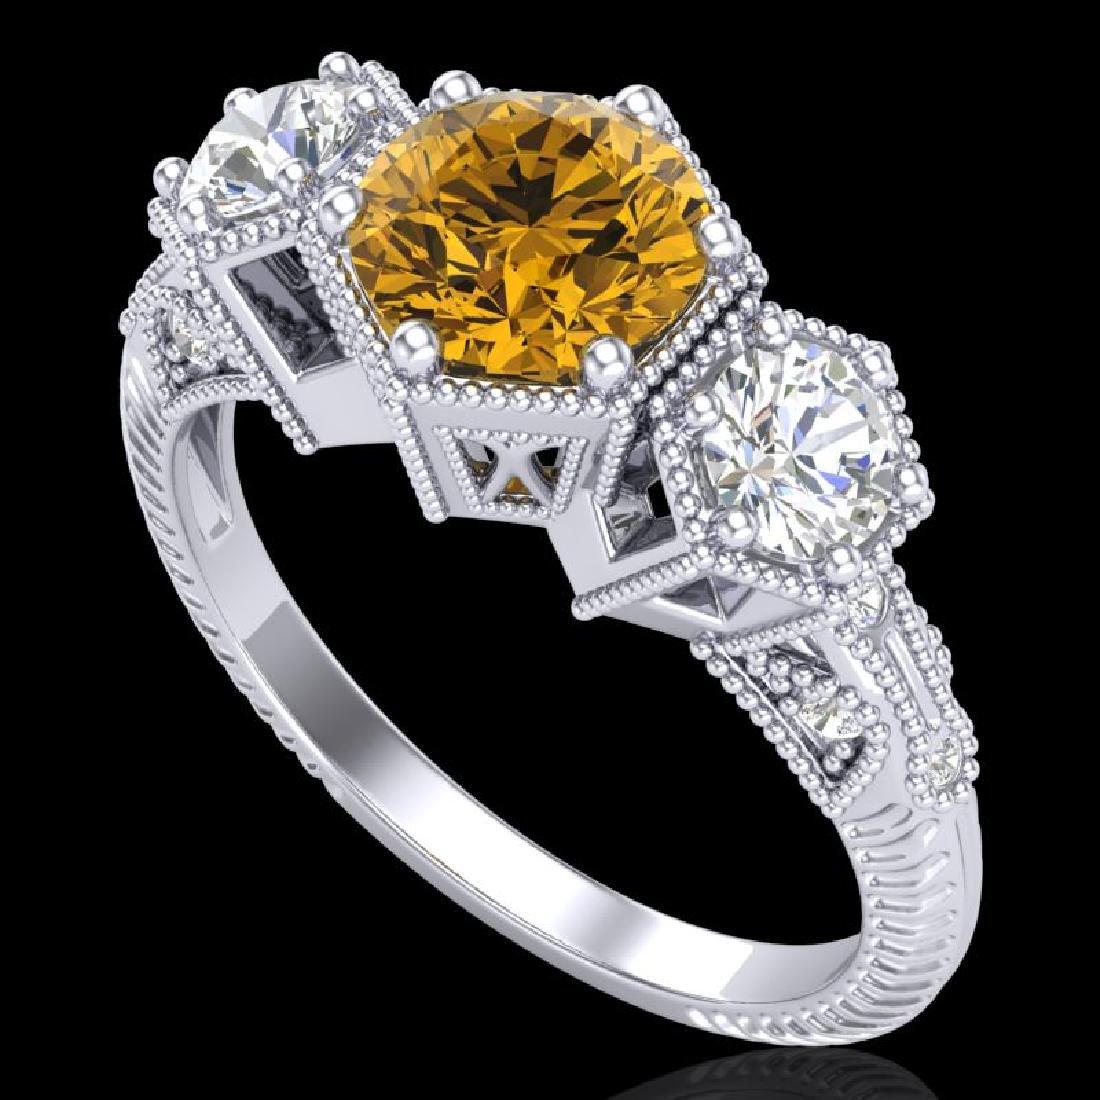 1.66 CTW Intense Fancy Yellow Diamond Art Deco 3 Stone